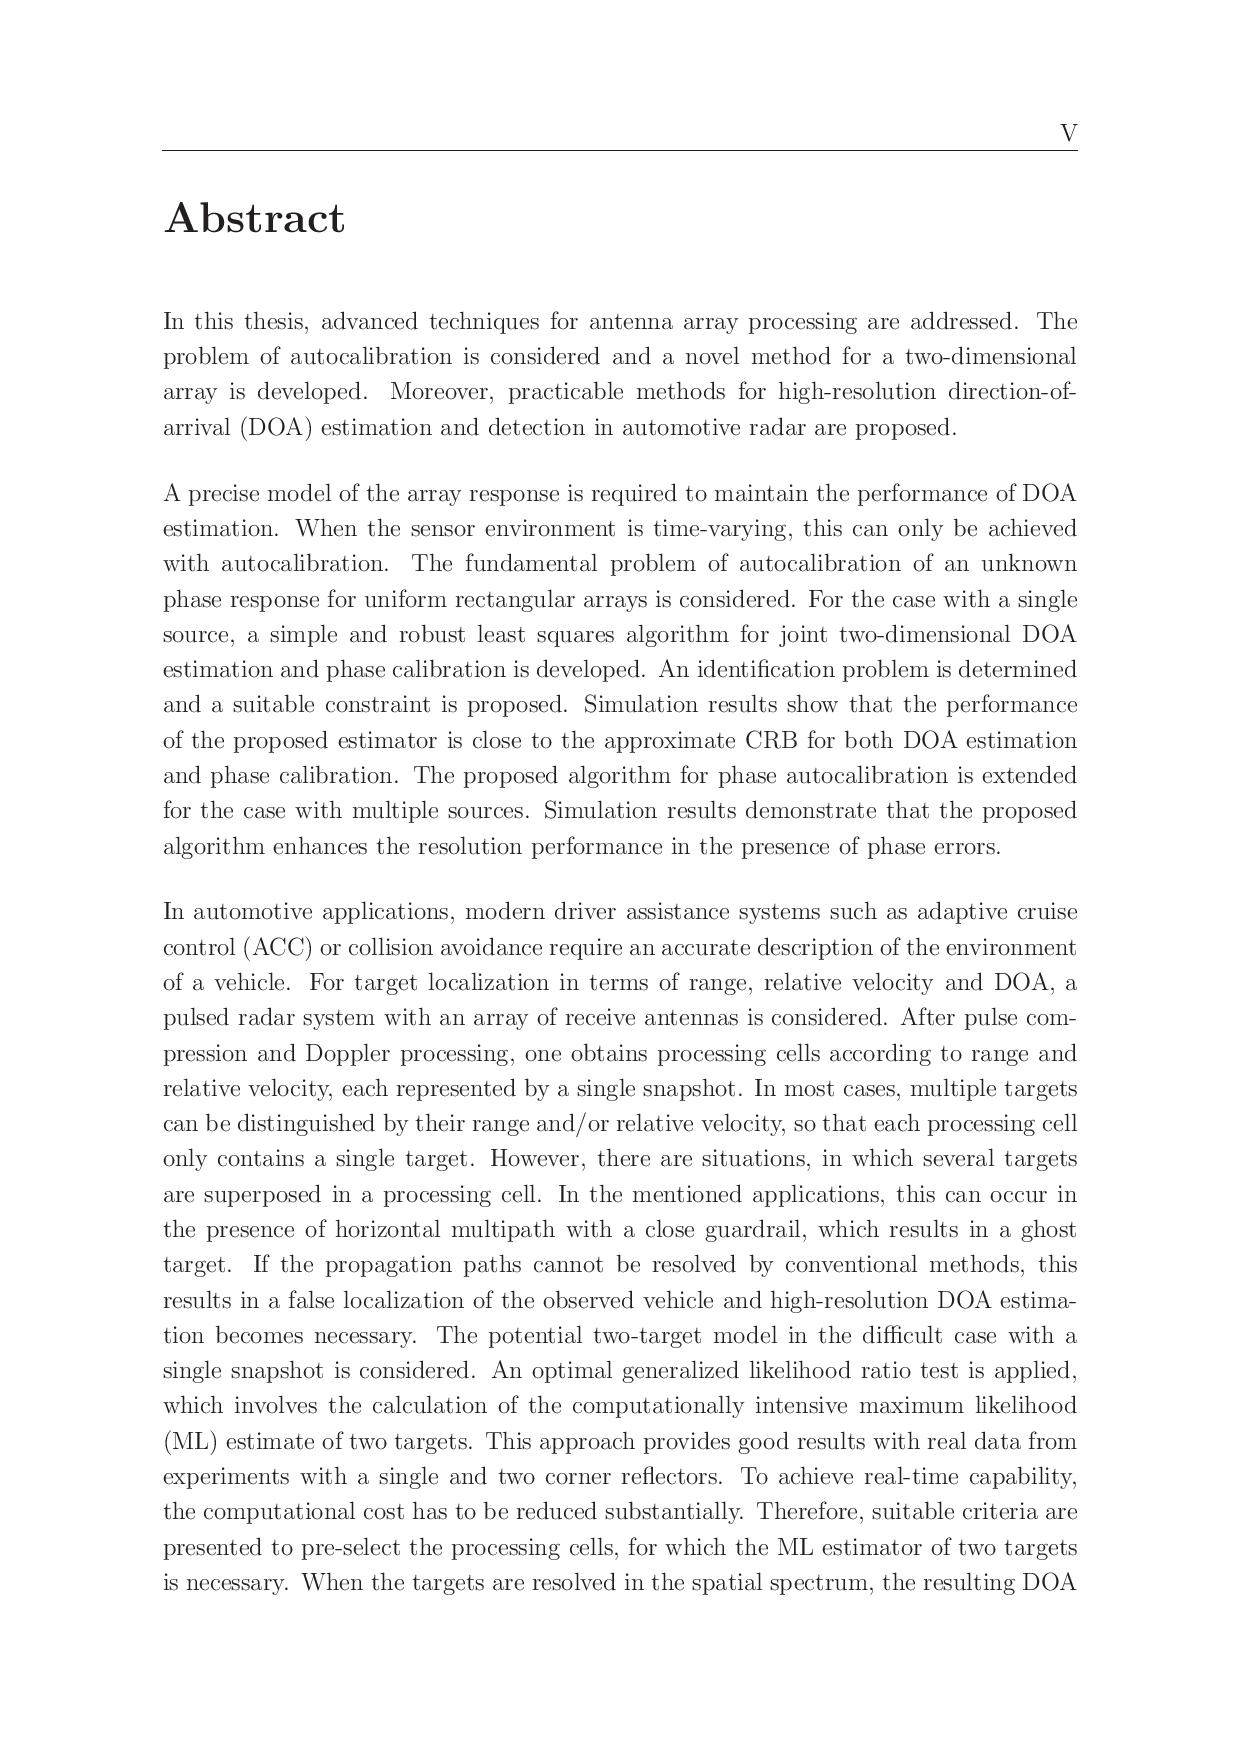 Diversity Essay Question  Mistyhamel College Diversity Essay Why Rankings Are Anti